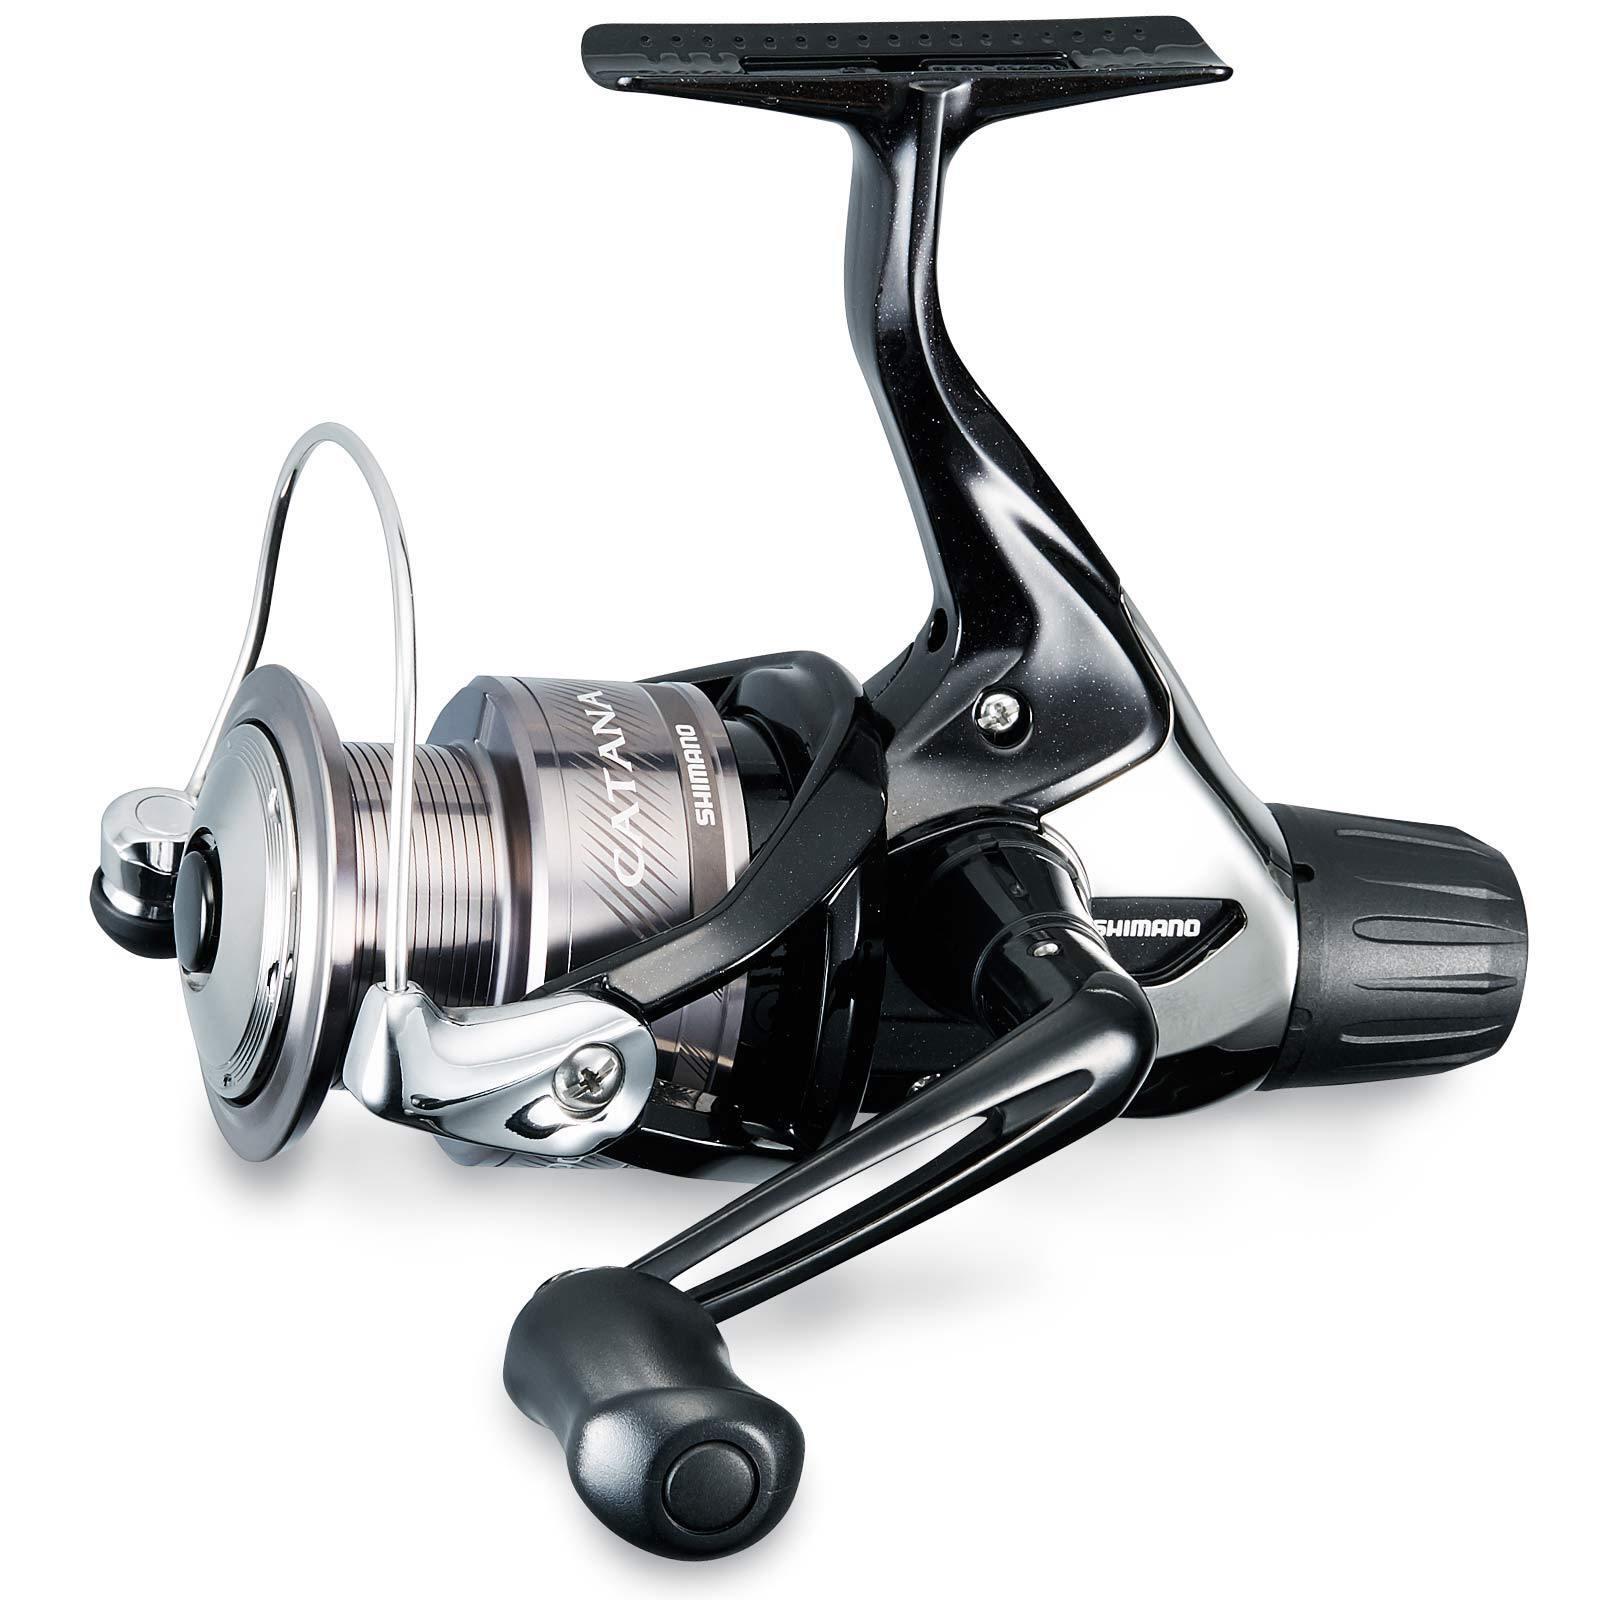 Cocherete de pesca Shimano trasero Drag Reel - Catana 2500 RC